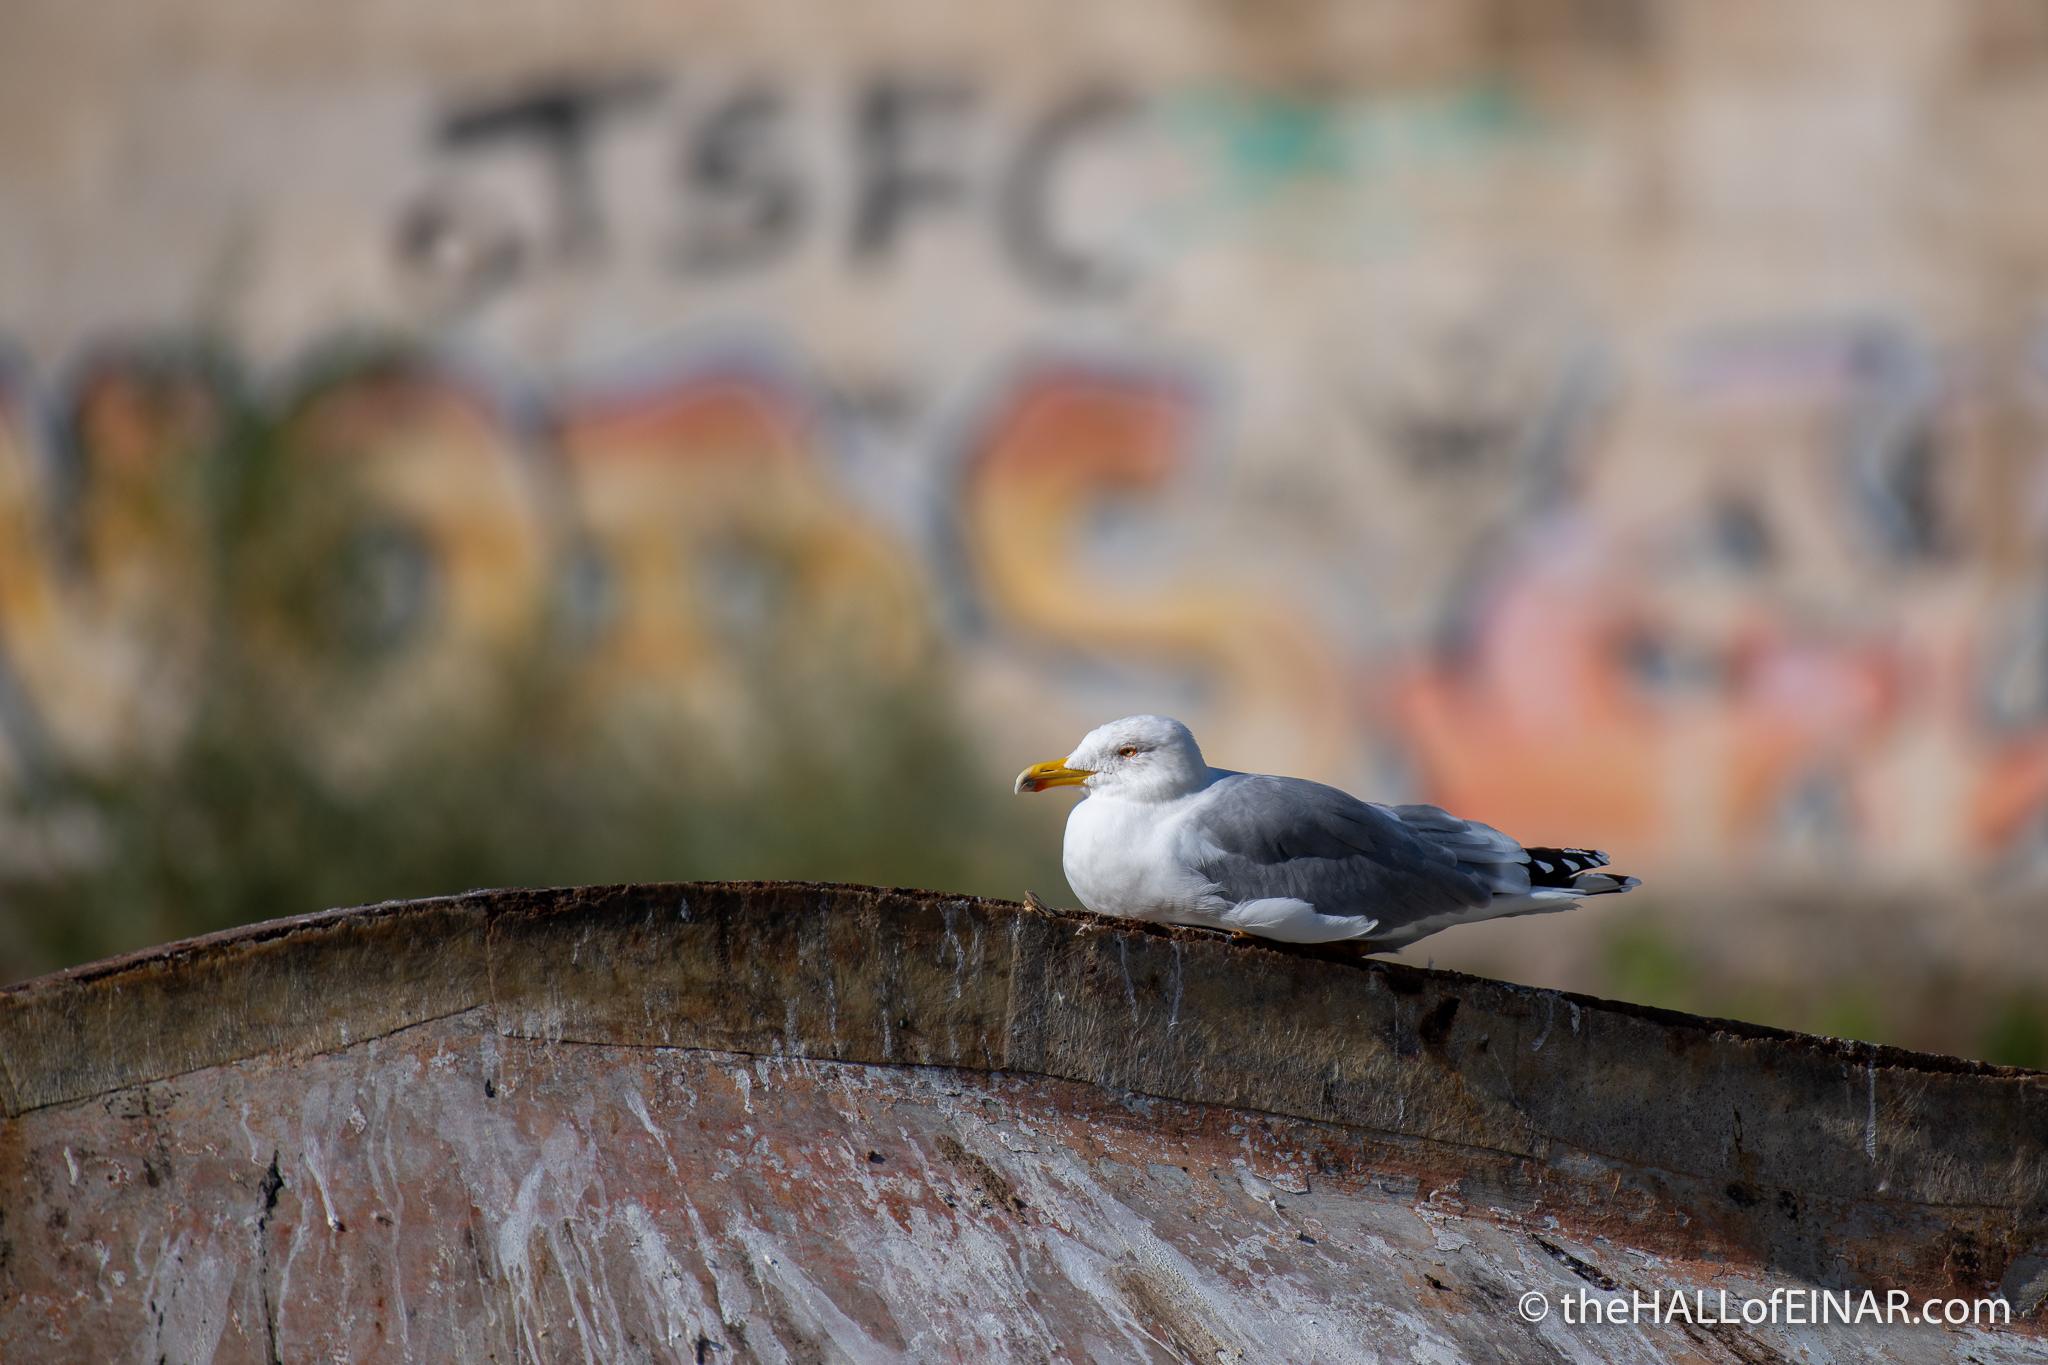 Yellow-Legged Gull - The Hall of Einar - photograph (c) David Bailey (not the)